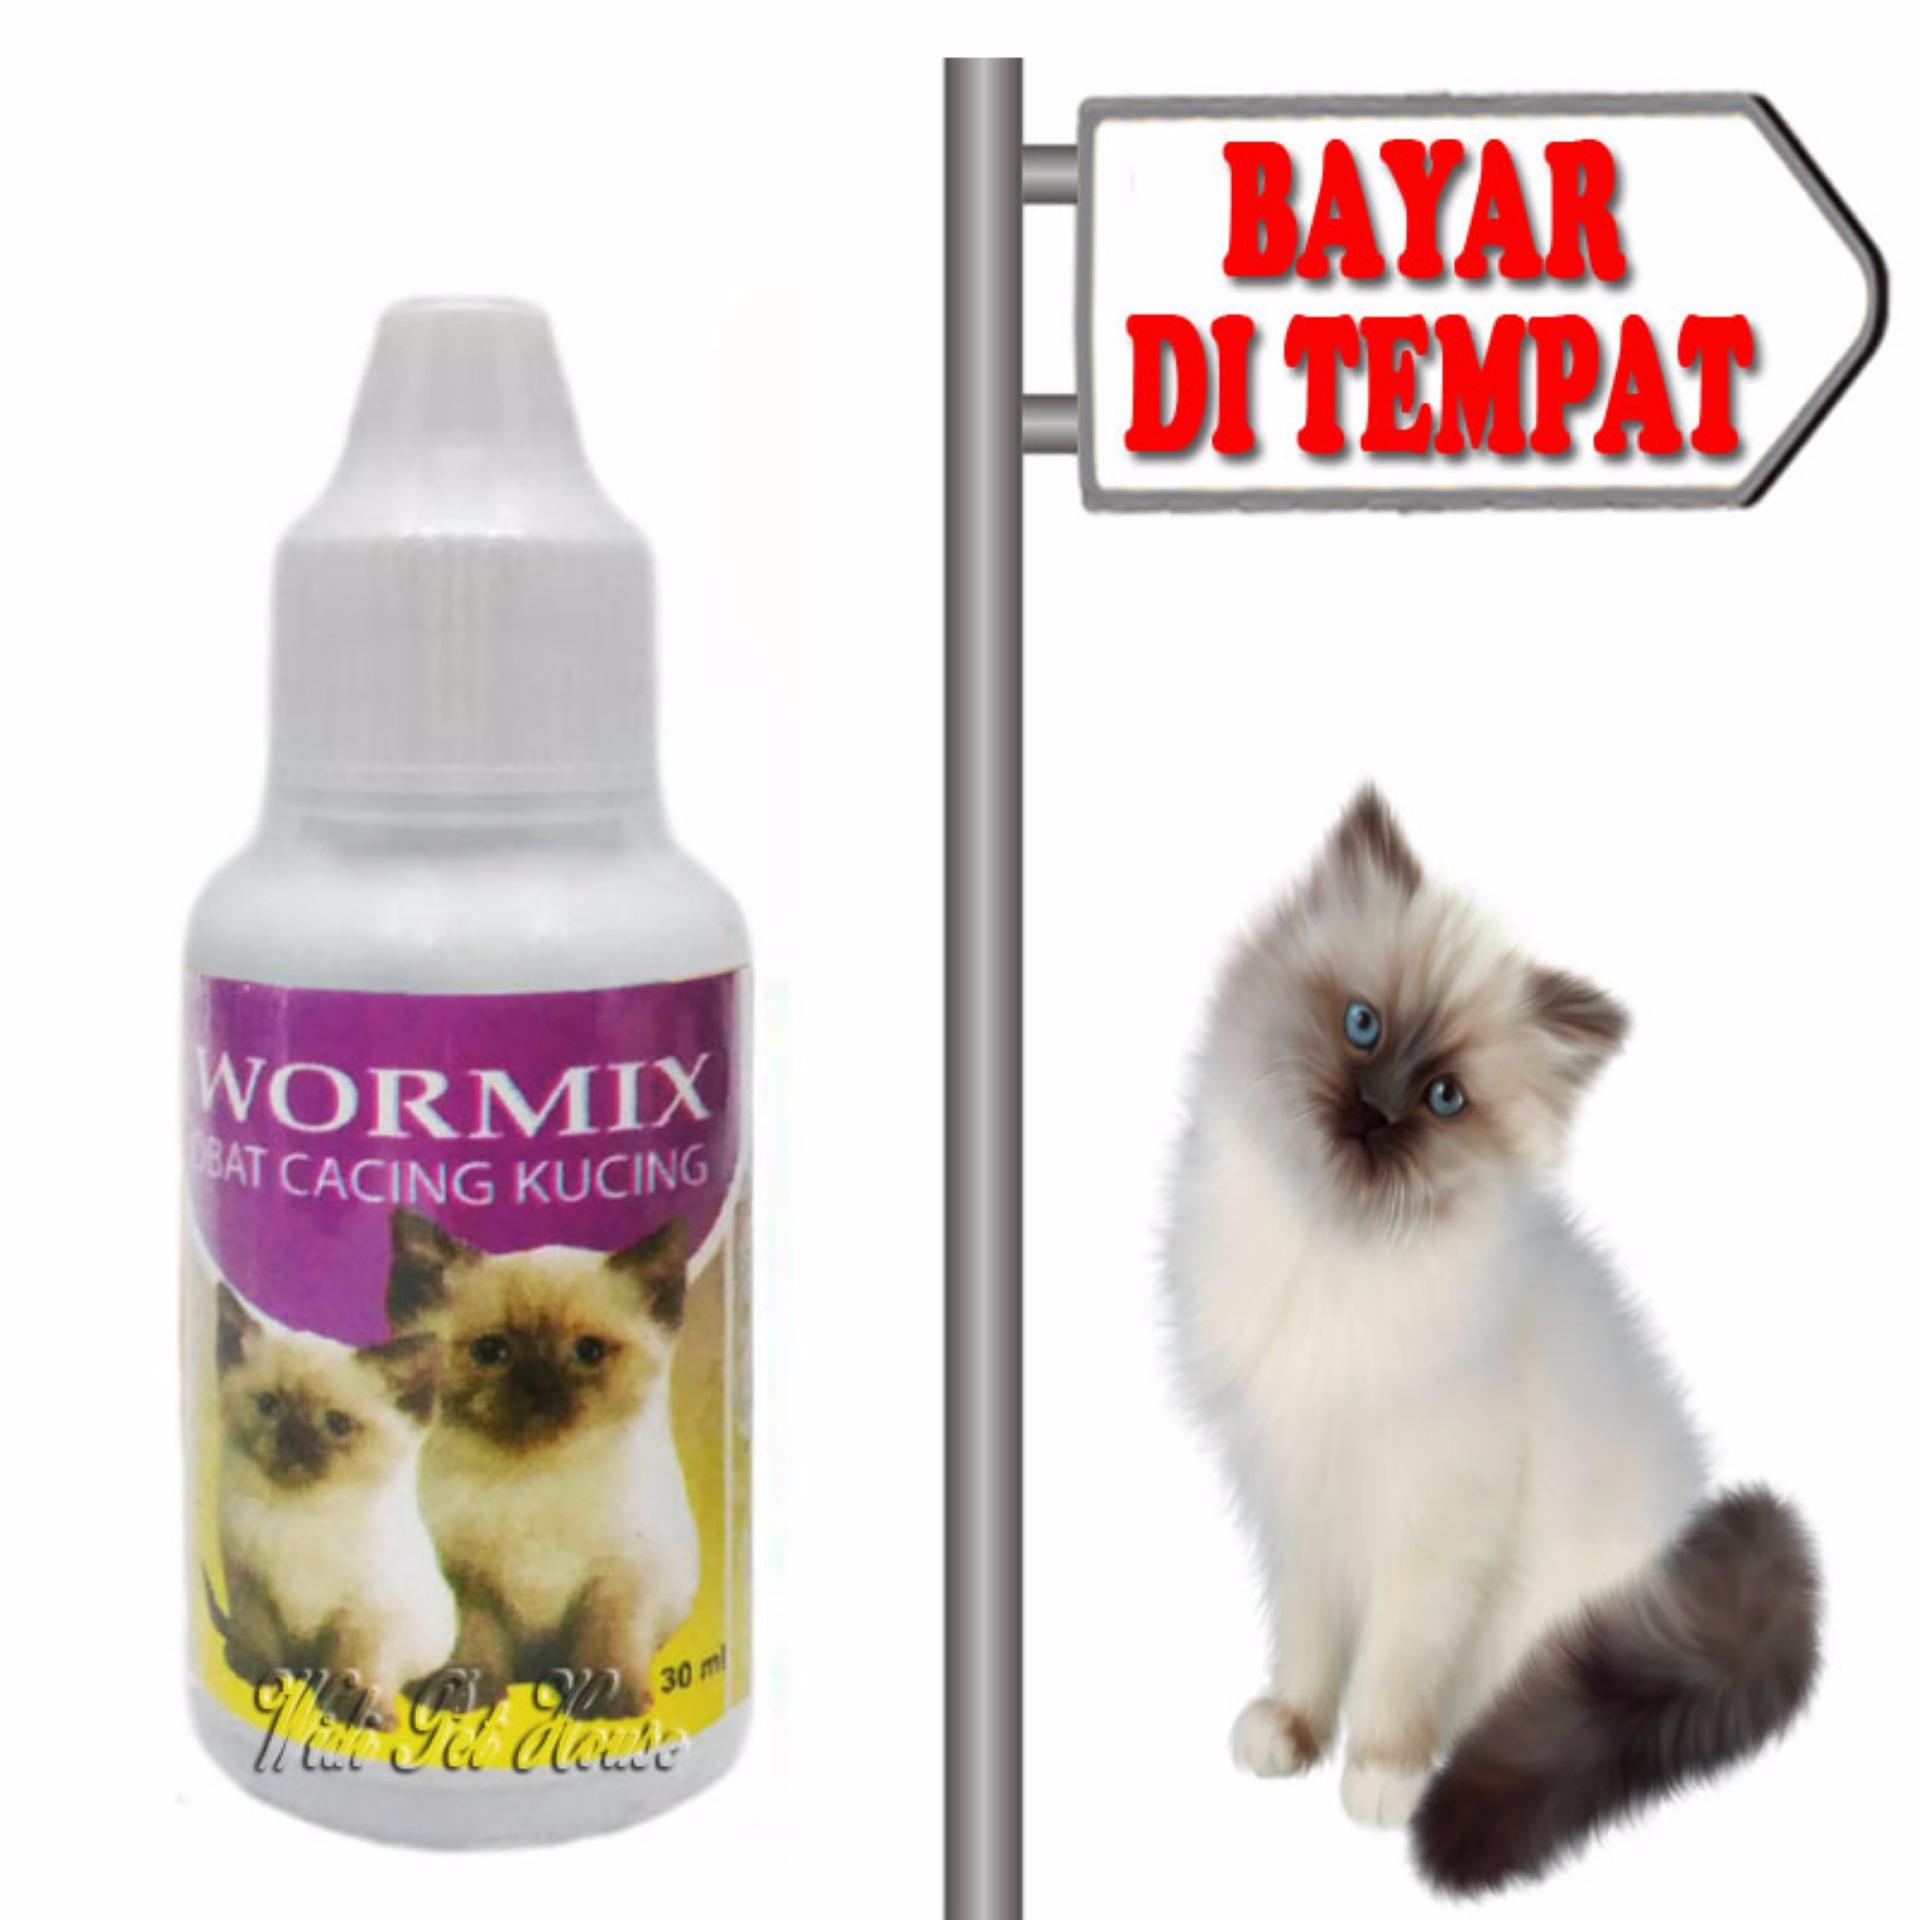 81 Gambar Obat Cacing Kucing Kekinian